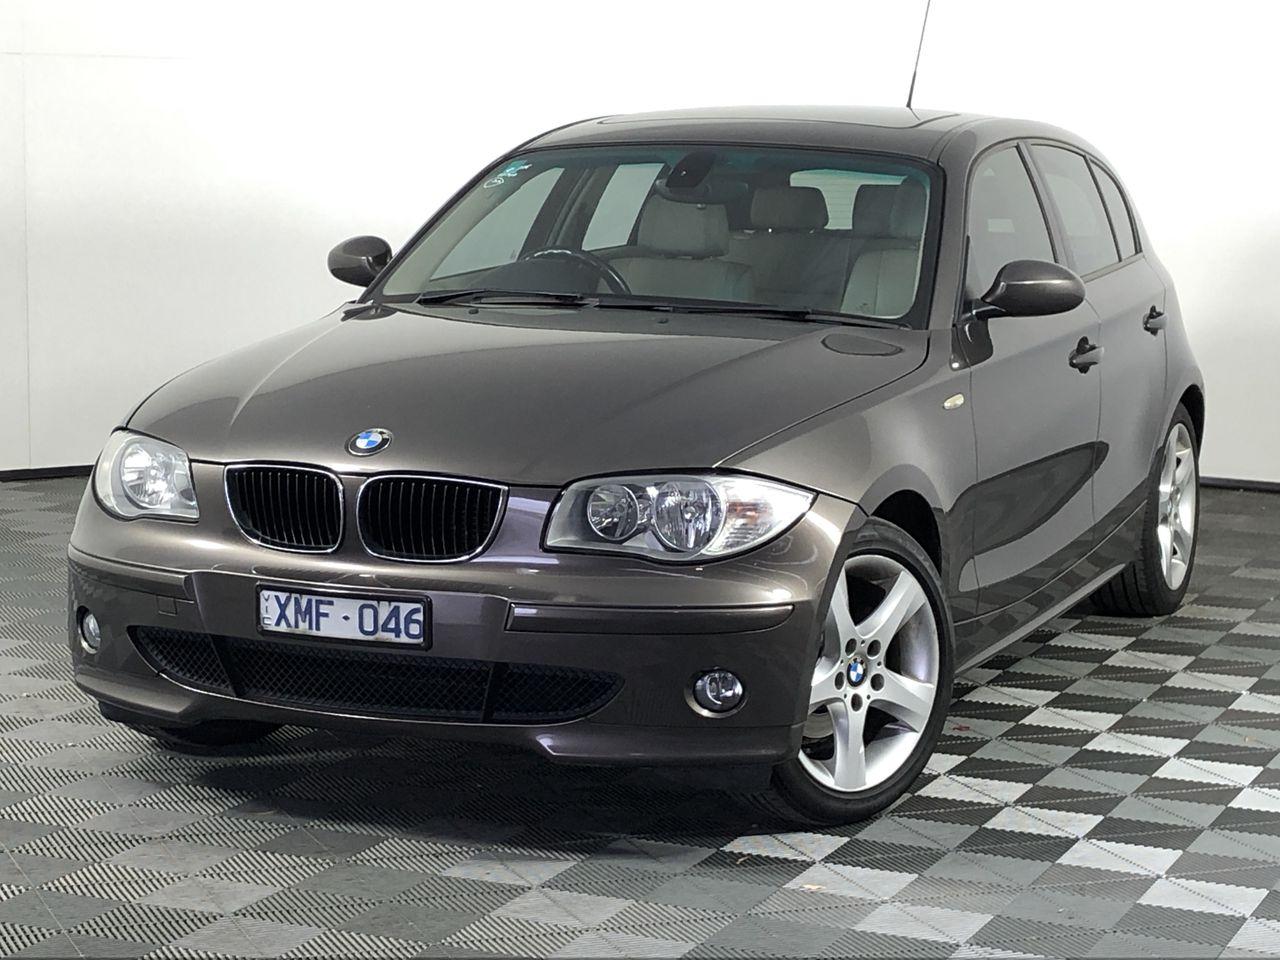 2007 BMW 1 20i E87 Automatic Hatchback